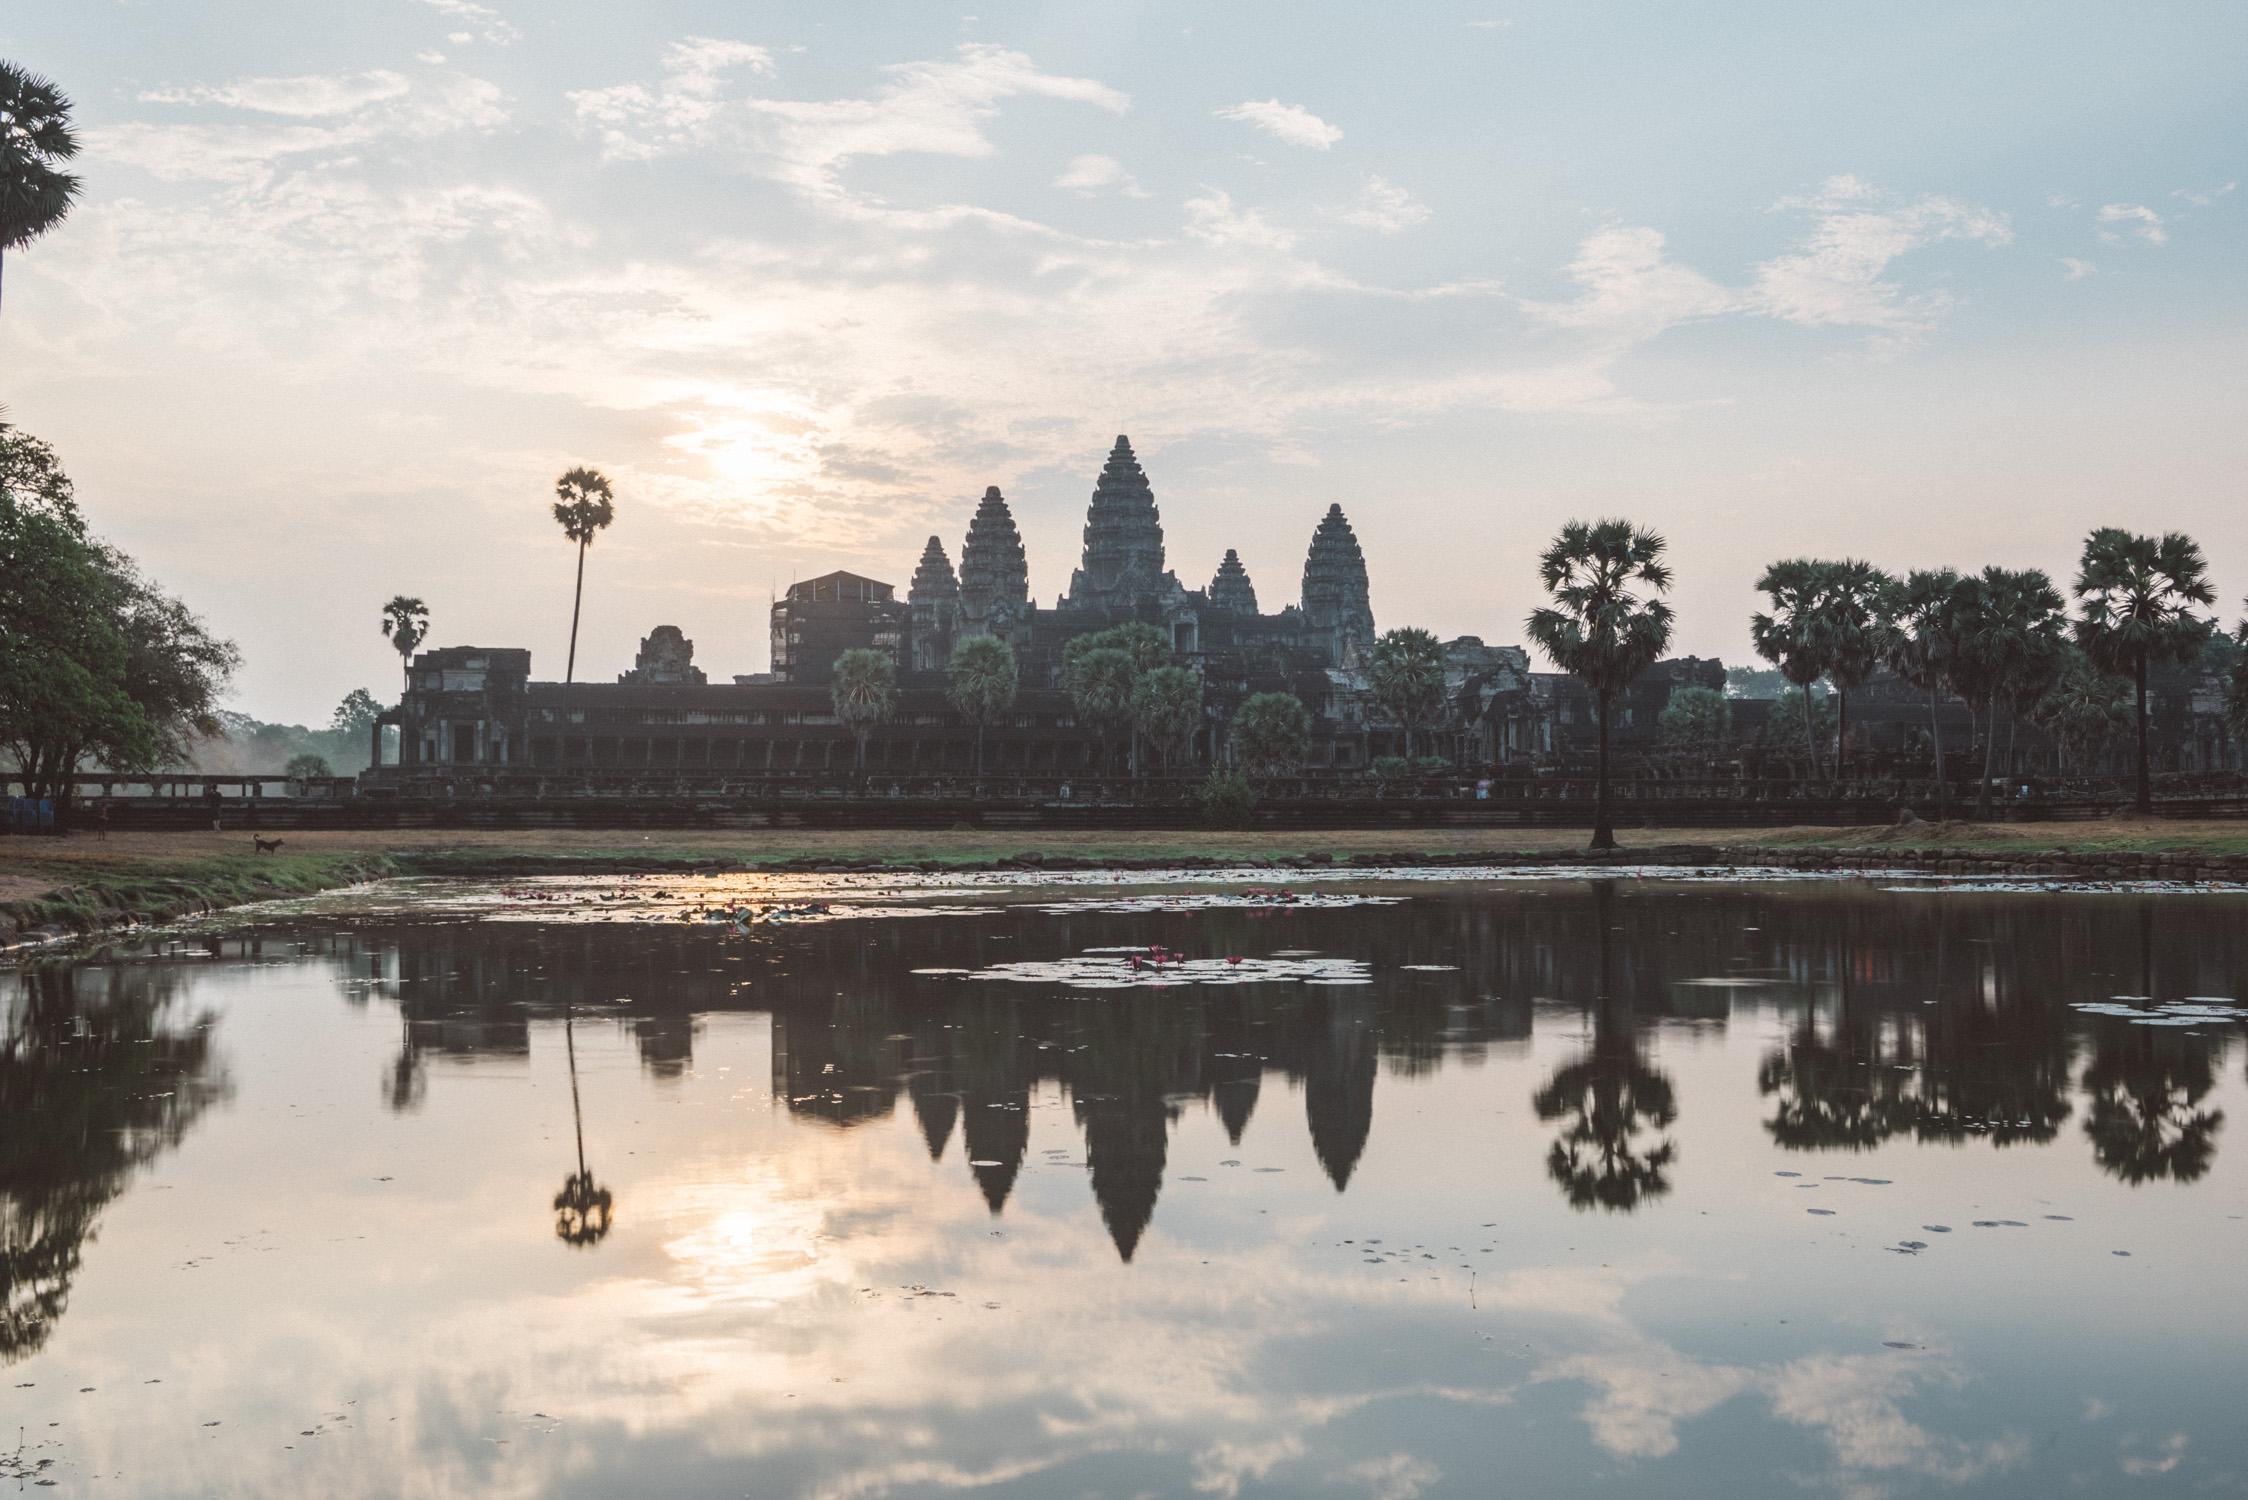 Angkor Wat sunrise reflexion [David Tan]